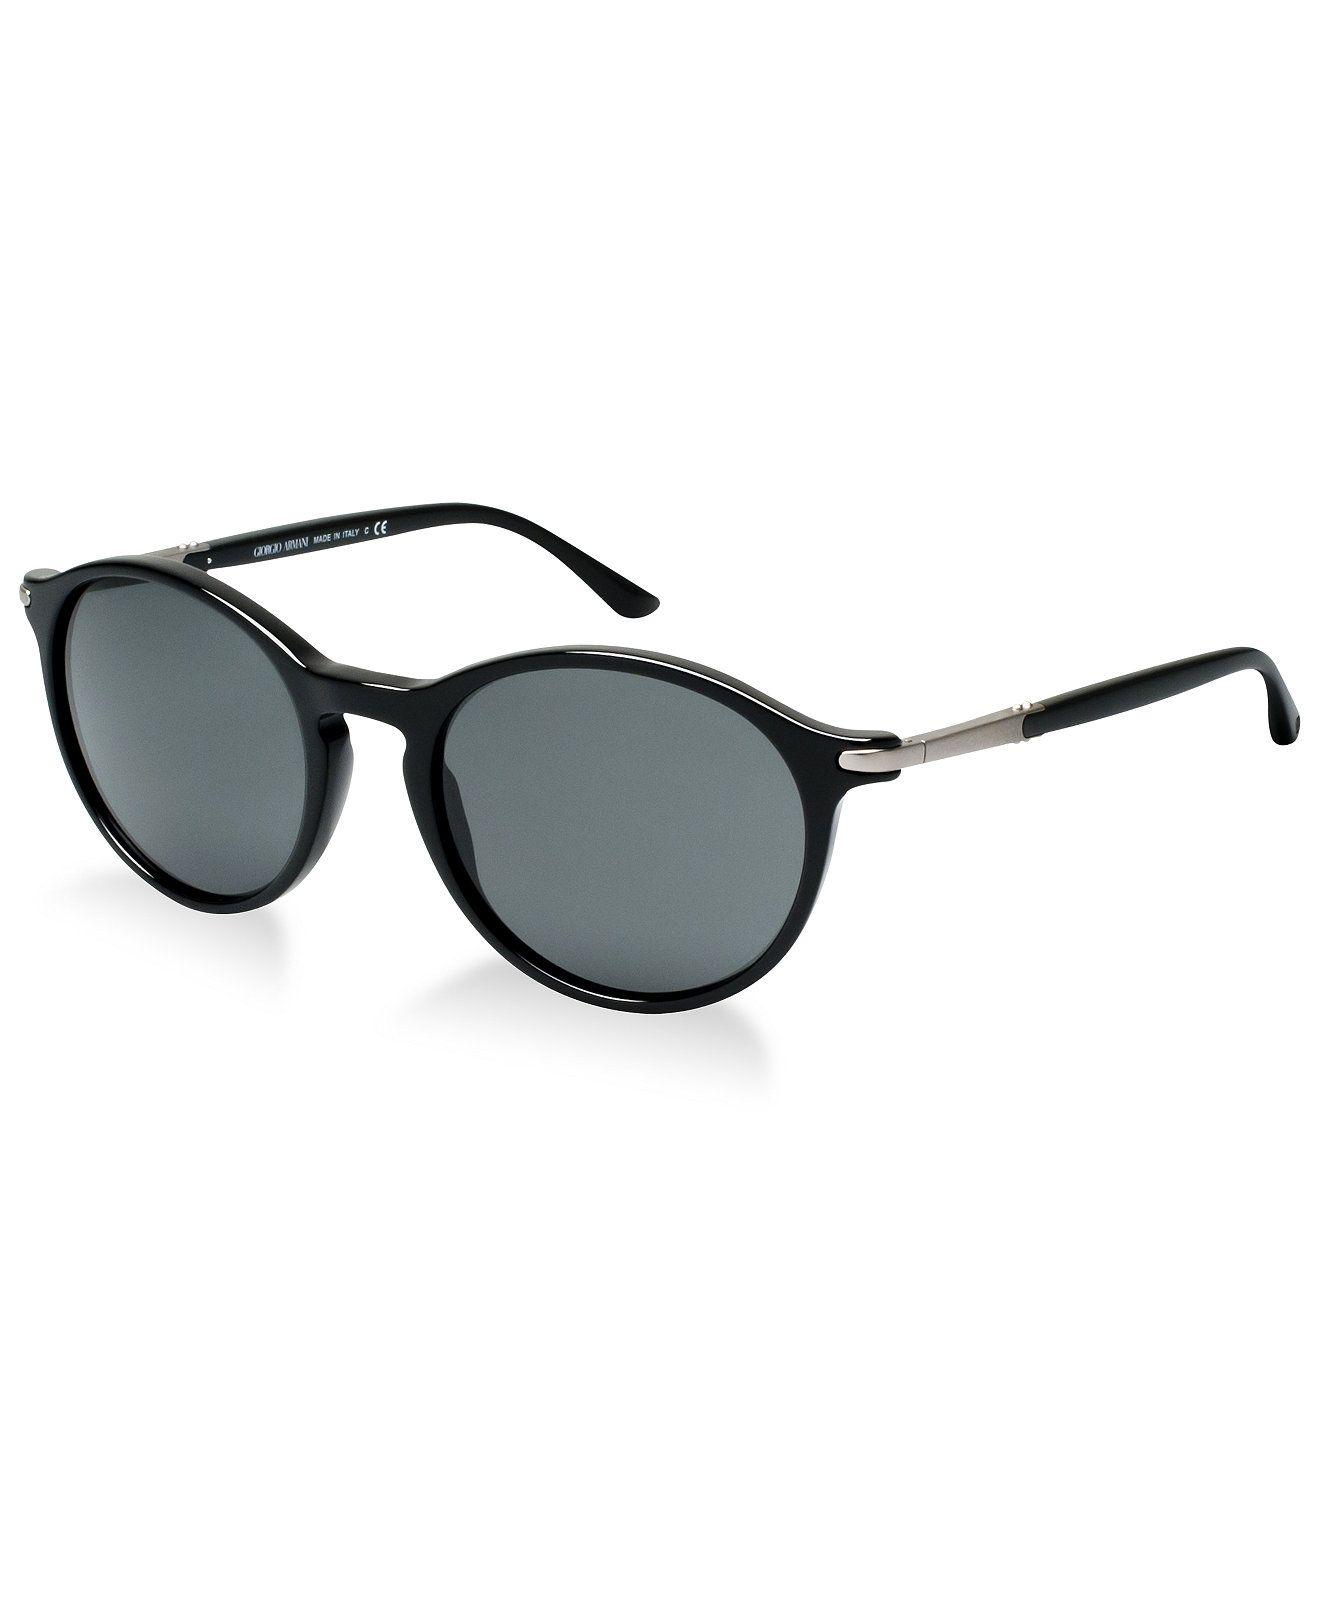 ba2f8e89d392 Pin by Shopular on Sunglasses